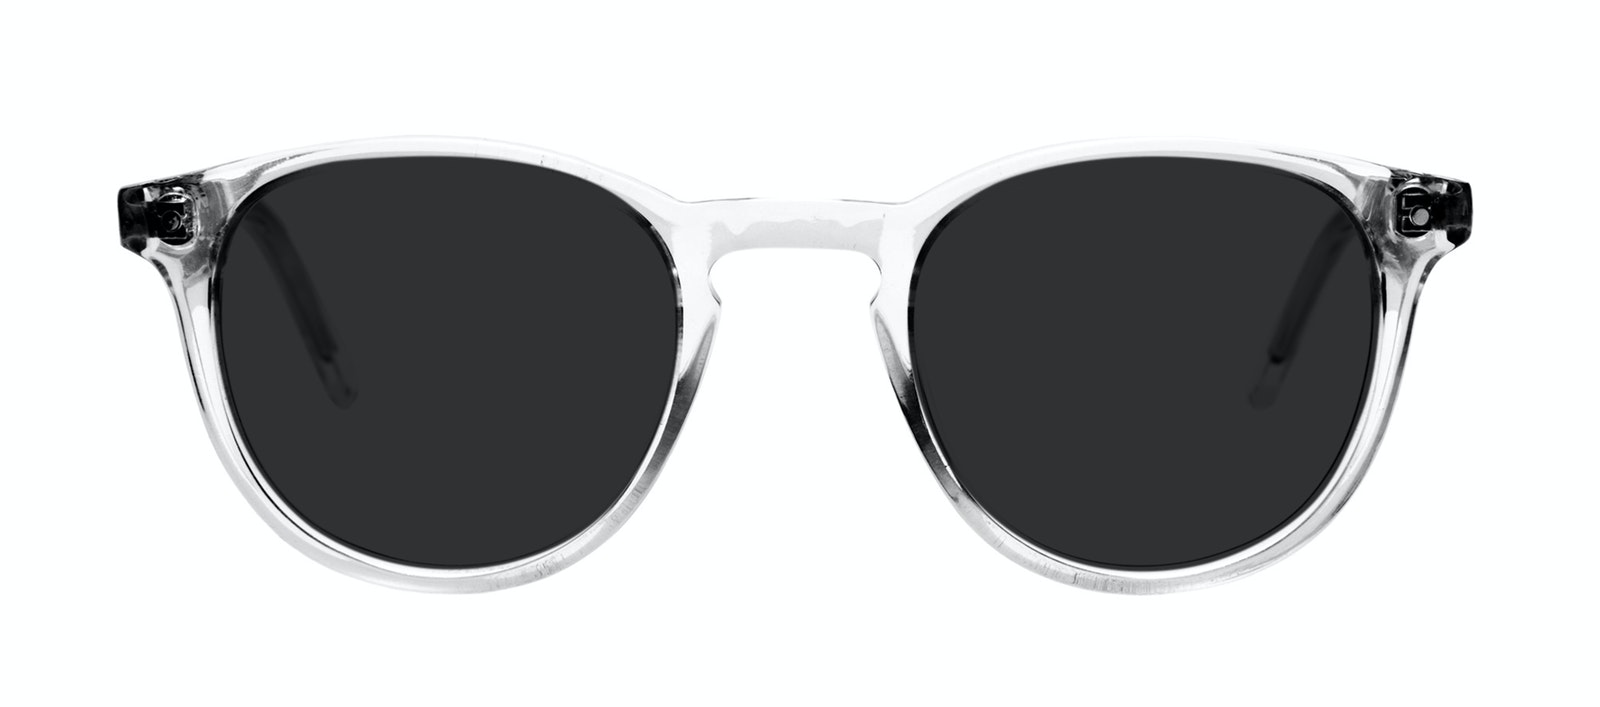 Affordable Fashion Glasses Round Sunglasses Men Cult Diamond Front